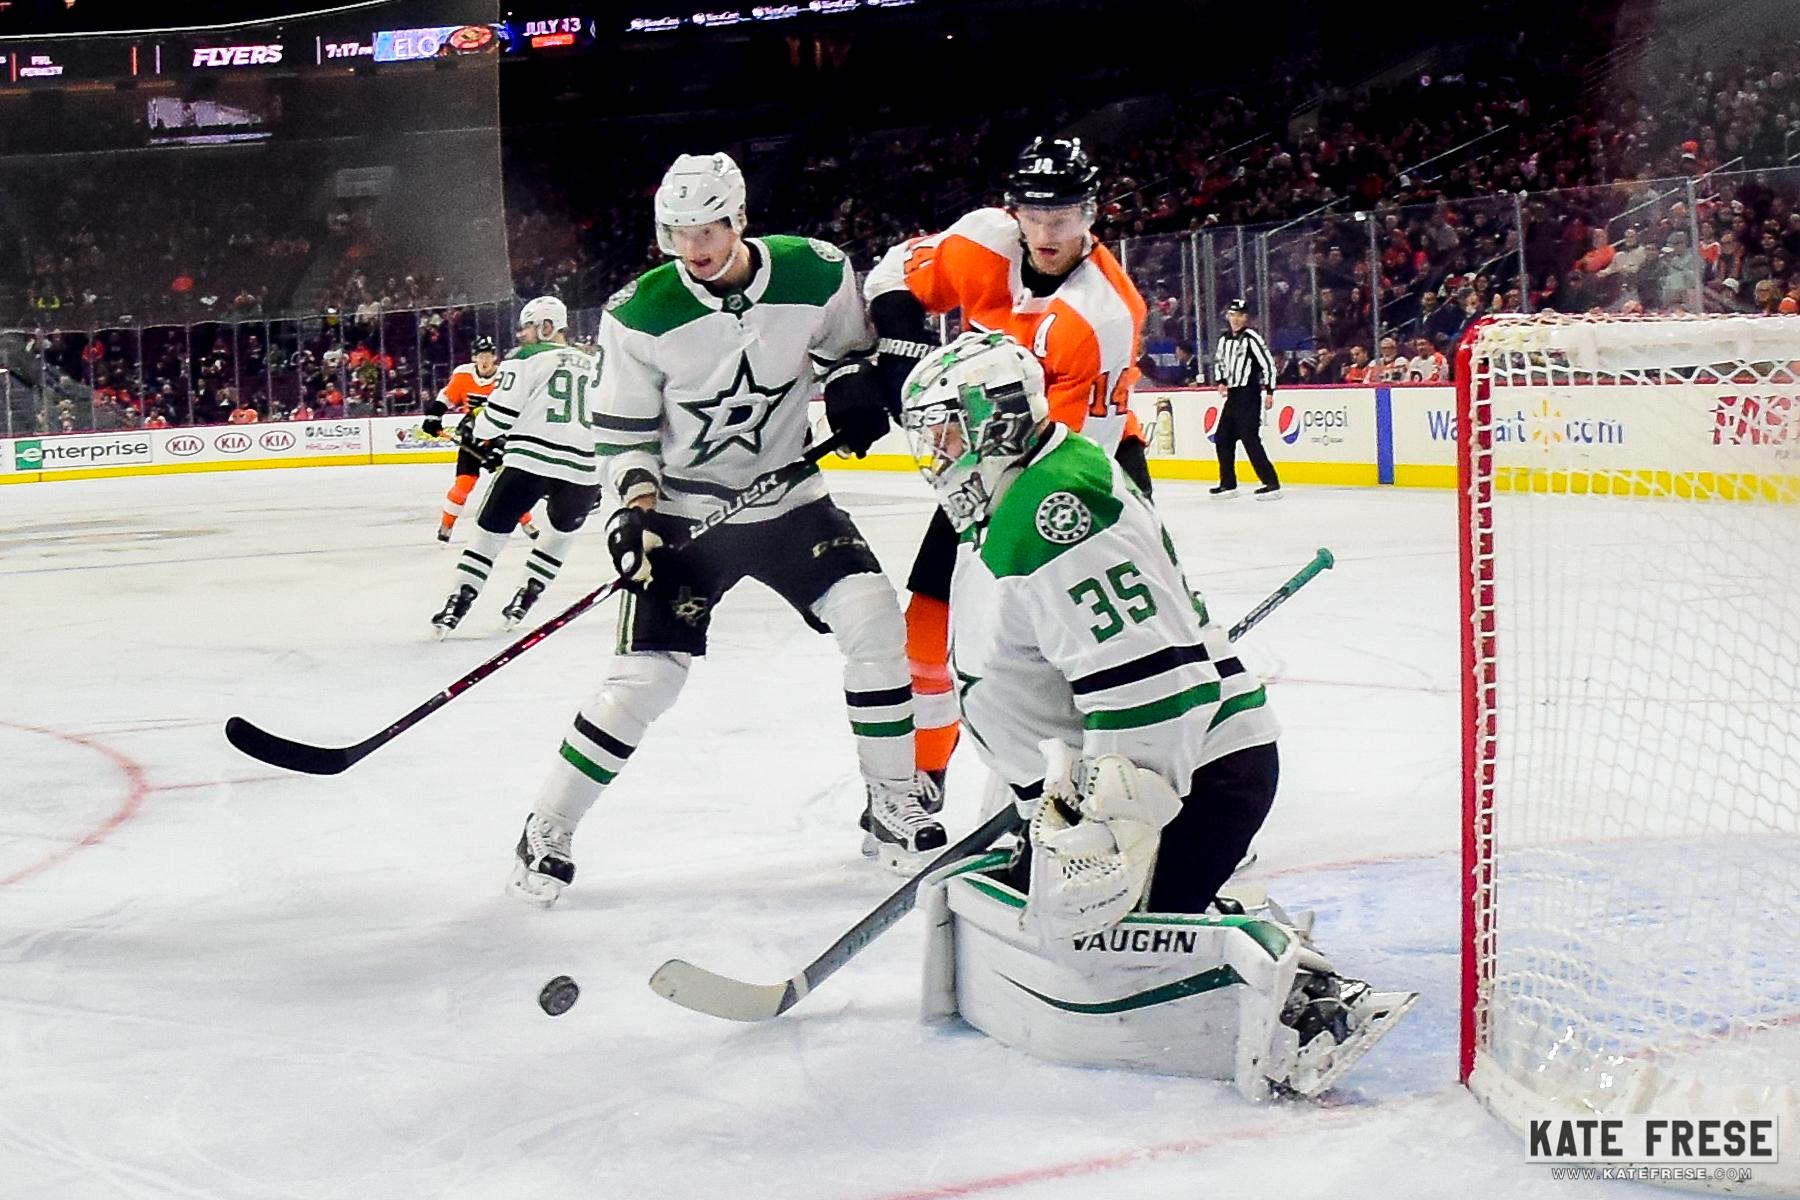 1-10-2019_FlyersvsStars_1st_credKateFres